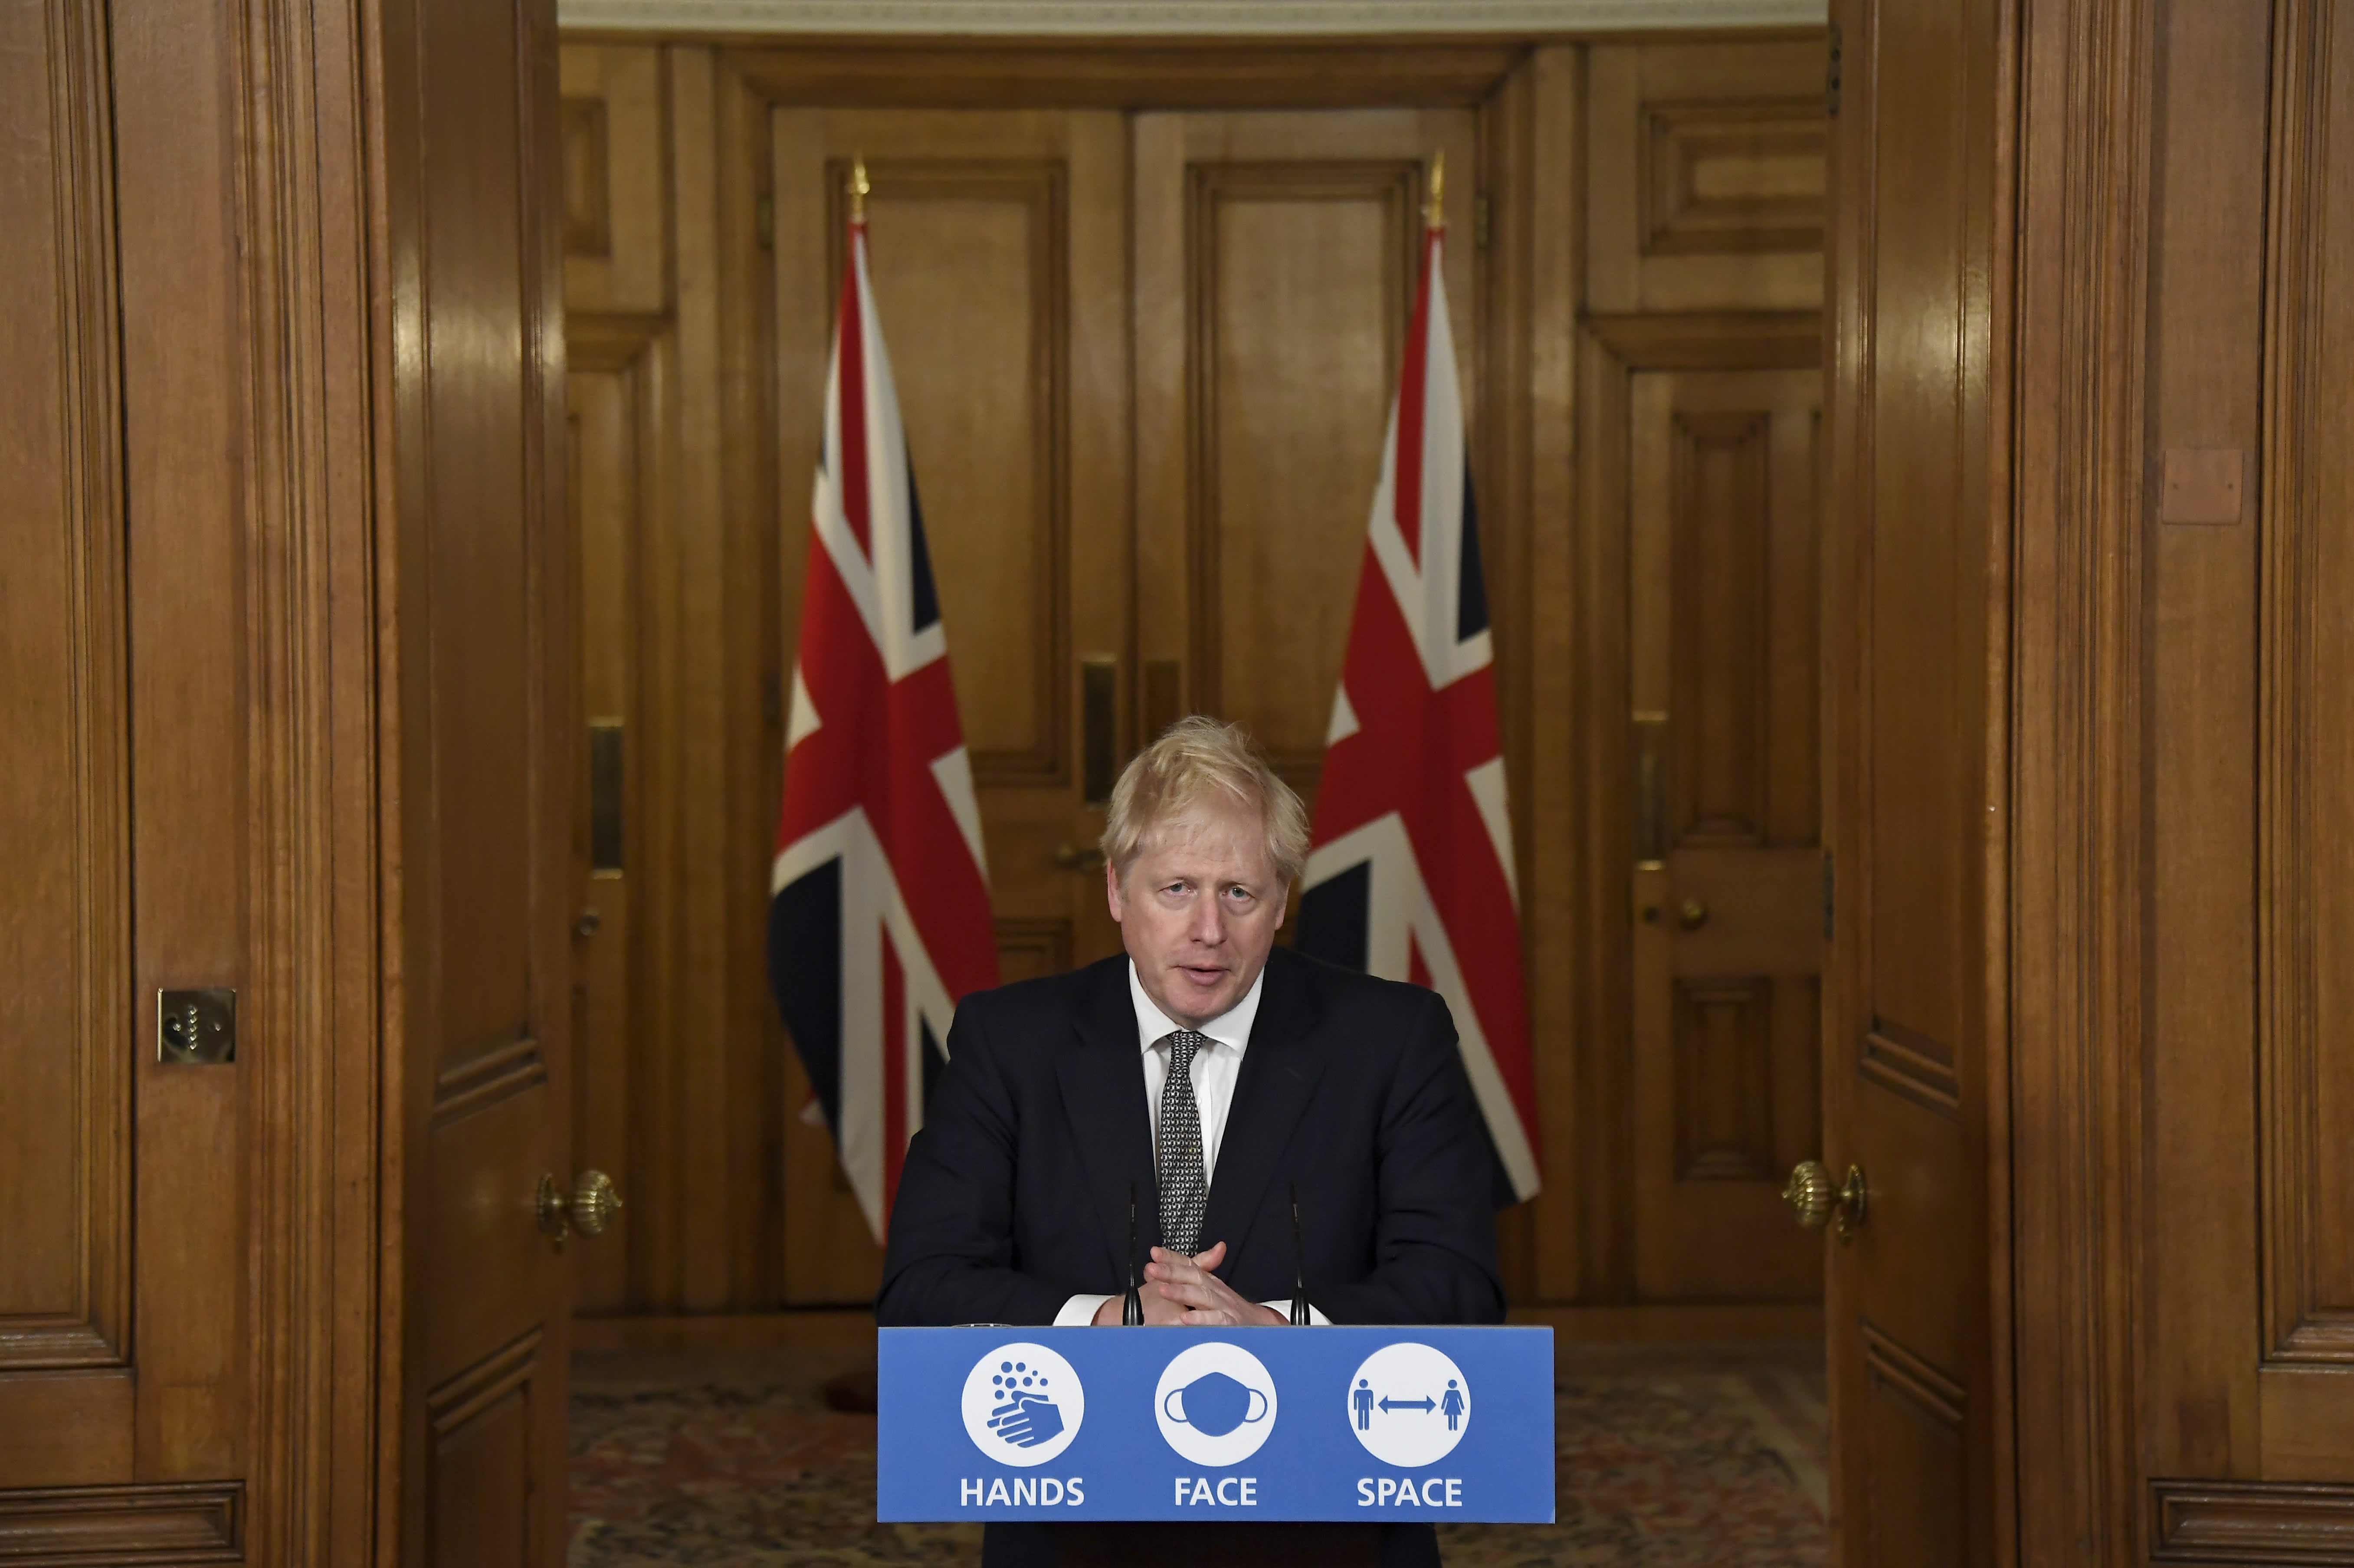 Prime Minister Boris Johnson imposes stay-at-home order in England as coronavirus cases rise thumbnail